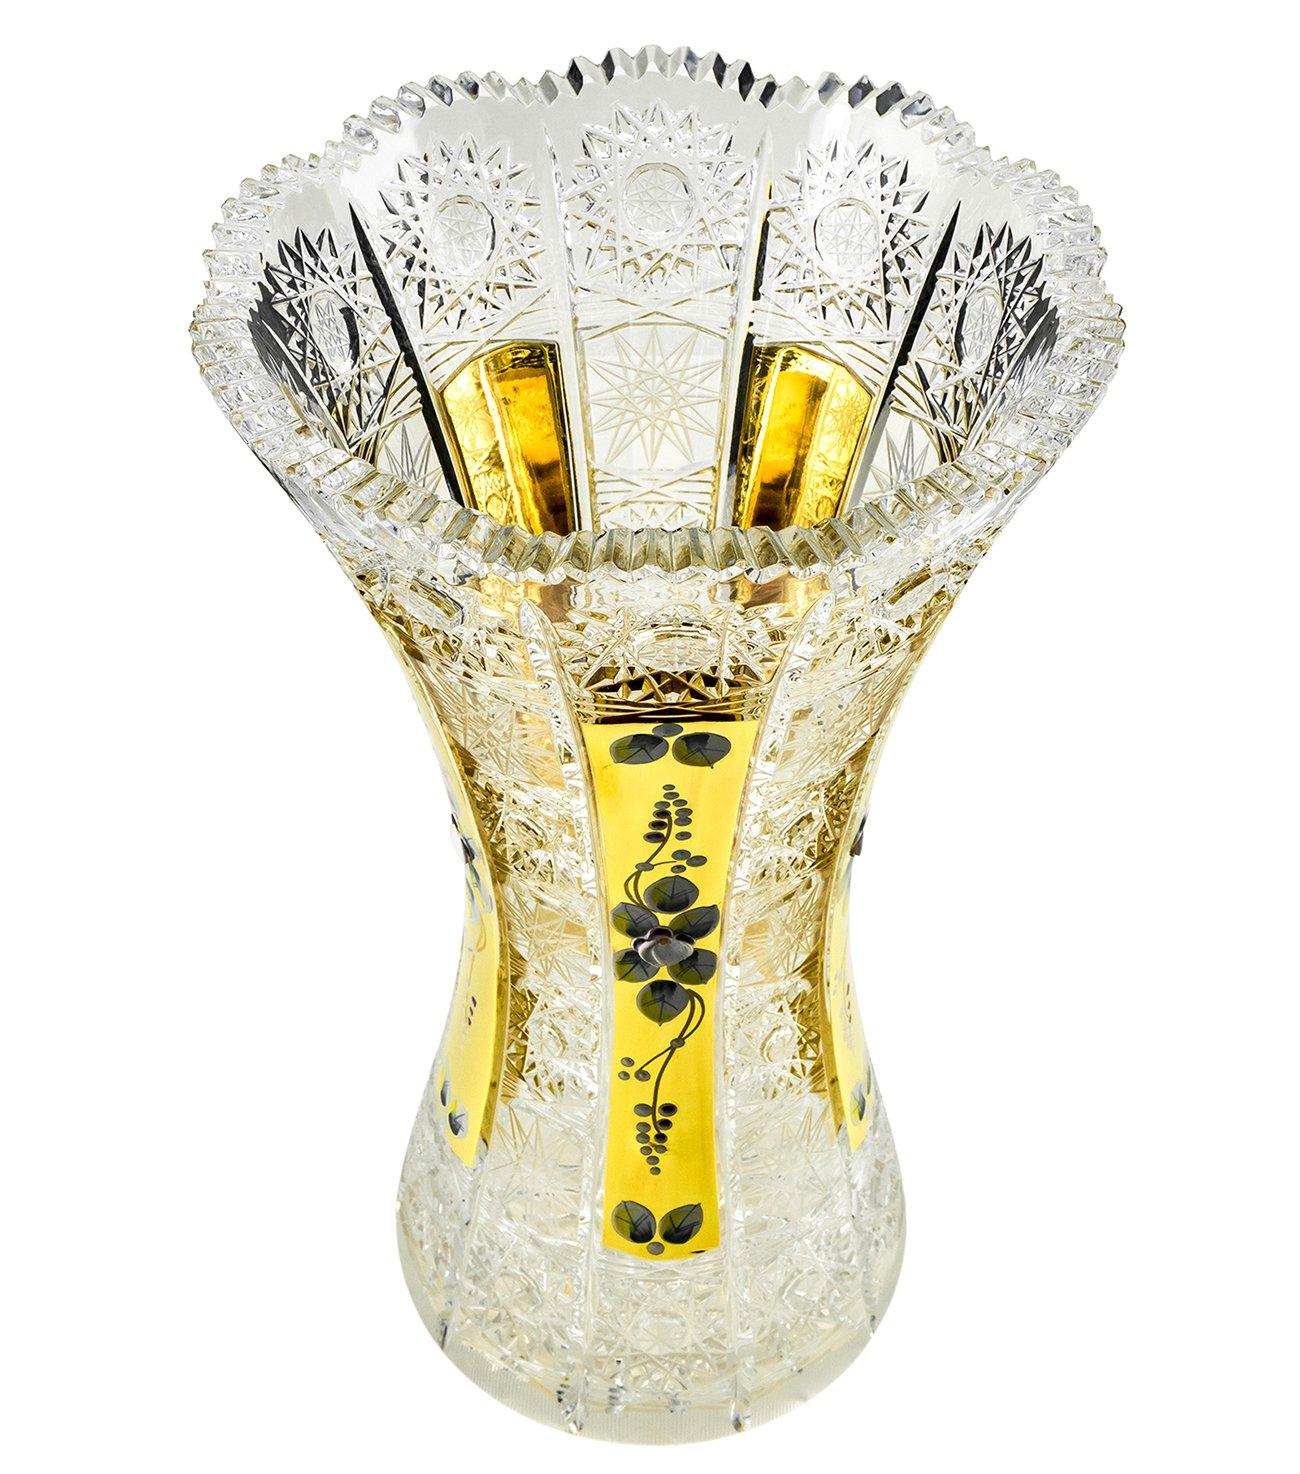 Bohemia Crystal 50522, 12''H Crystal Cut Decorative Clear Flower Vase with Golden Sputtering, Elegant Centerpiece Wedding Gift Gold-Plated Bud Vase